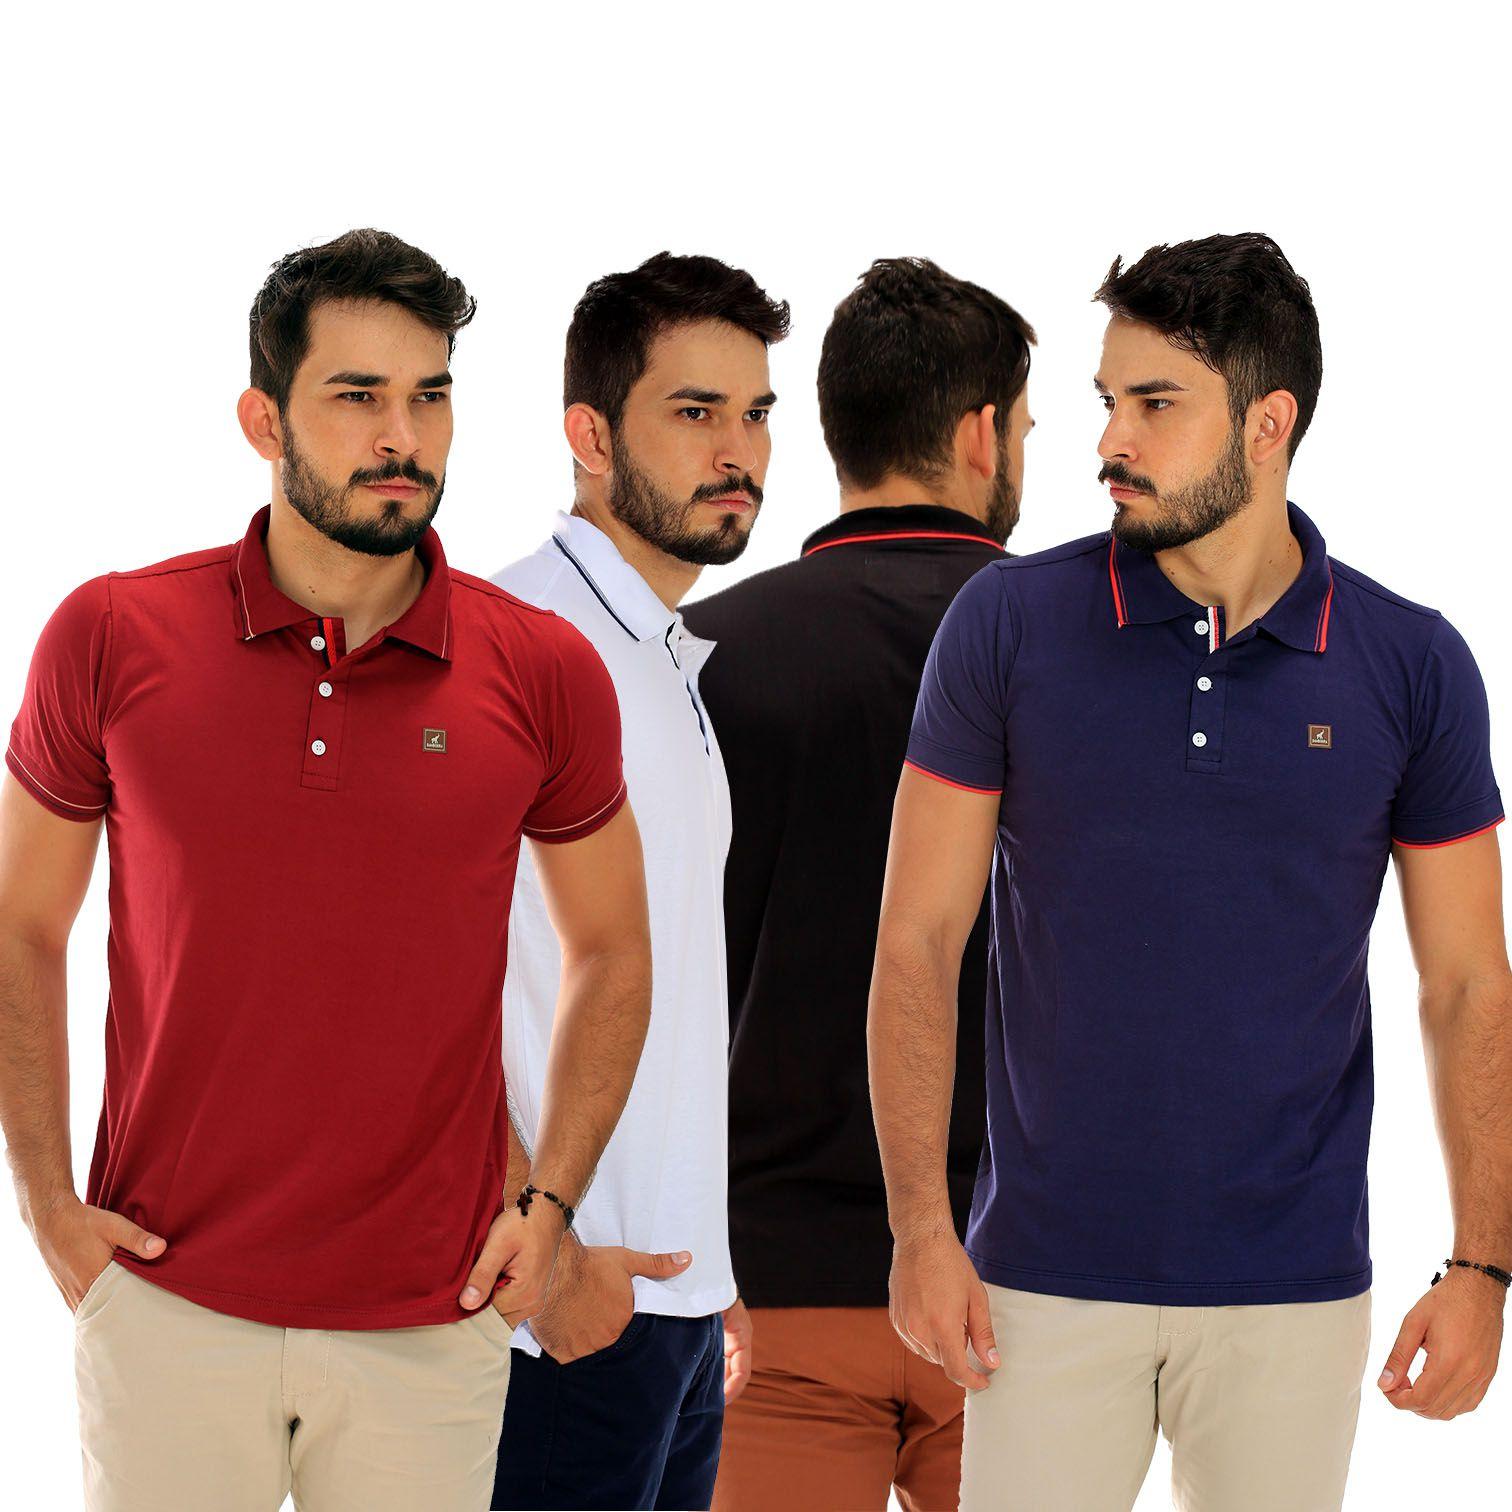 Kit com 4 Camisas Polo Masculinas Básicas Lisas